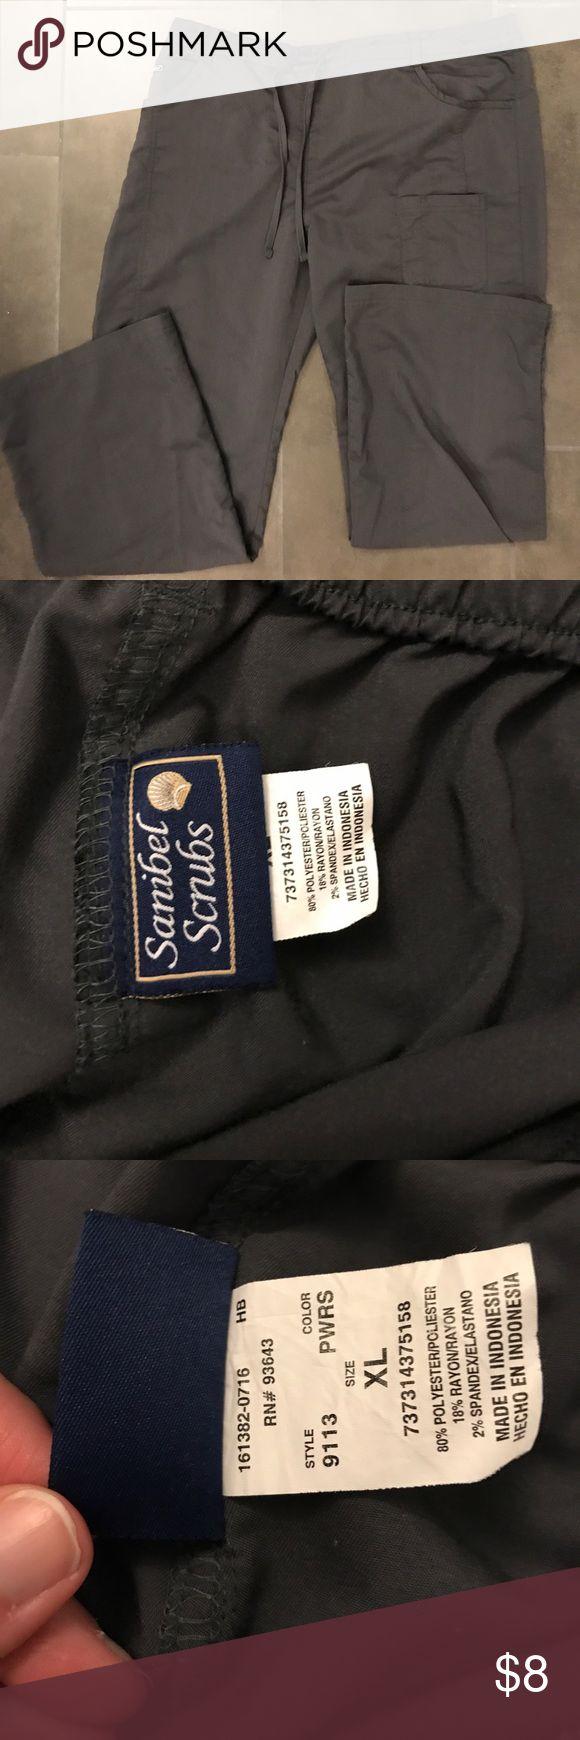 XL scrub pants Great gray Sanibel scrub pants with drawstring waist and elastic back. Super comfy and easy to wear Sanibel Pants